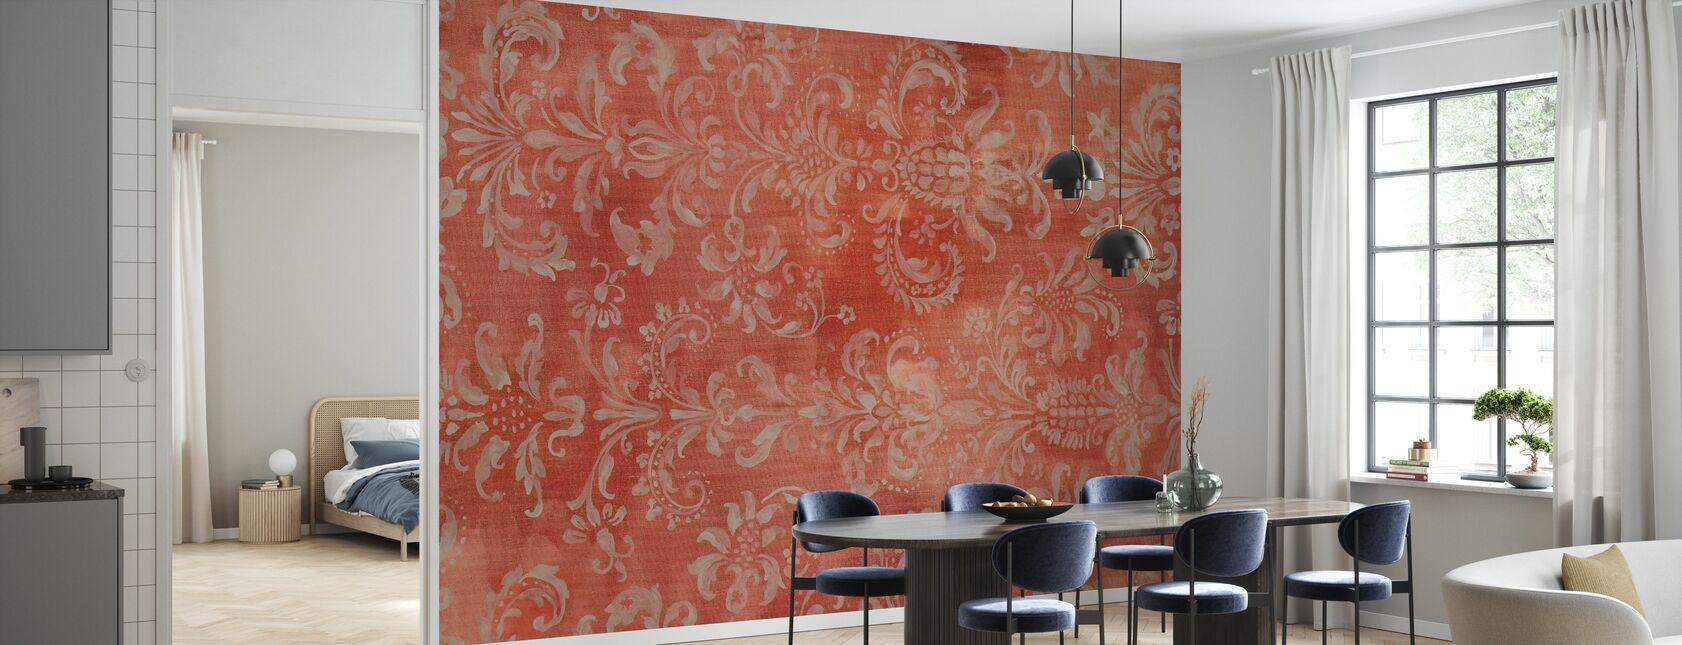 Damask Texture - Wallpaper - Kitchen